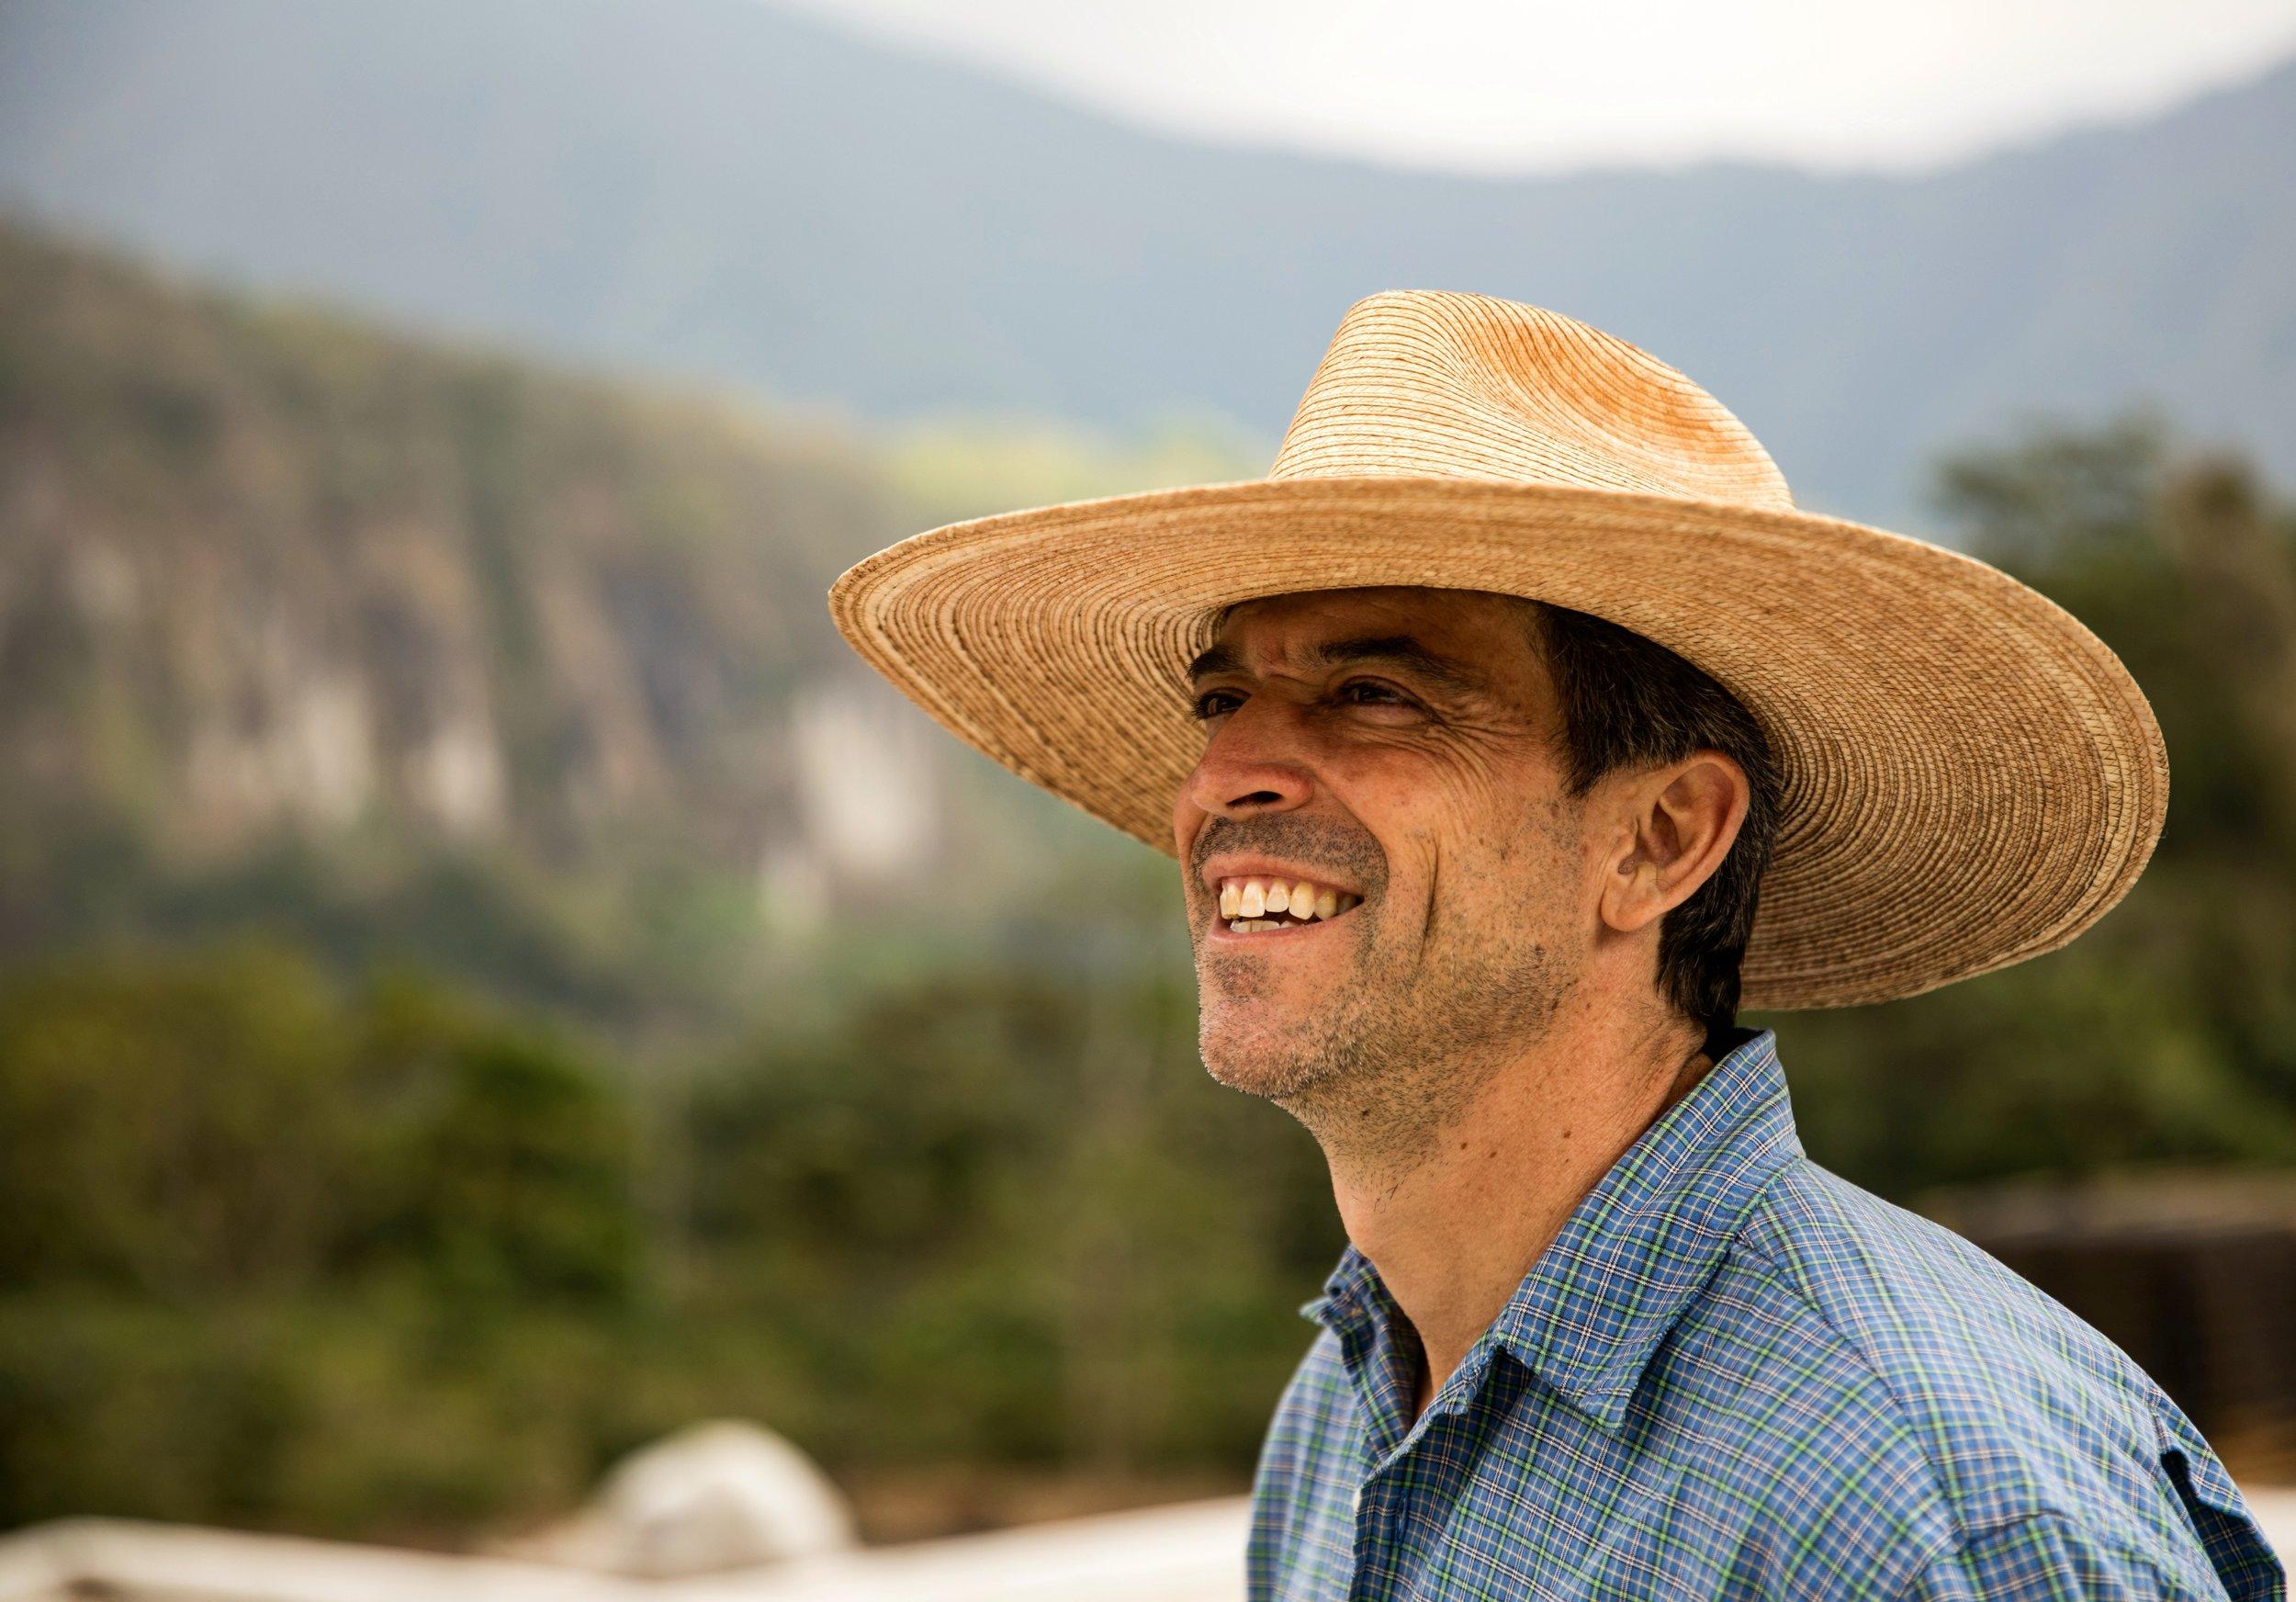 Andres, owner of Santo Tomas Pachuj - Guatemala